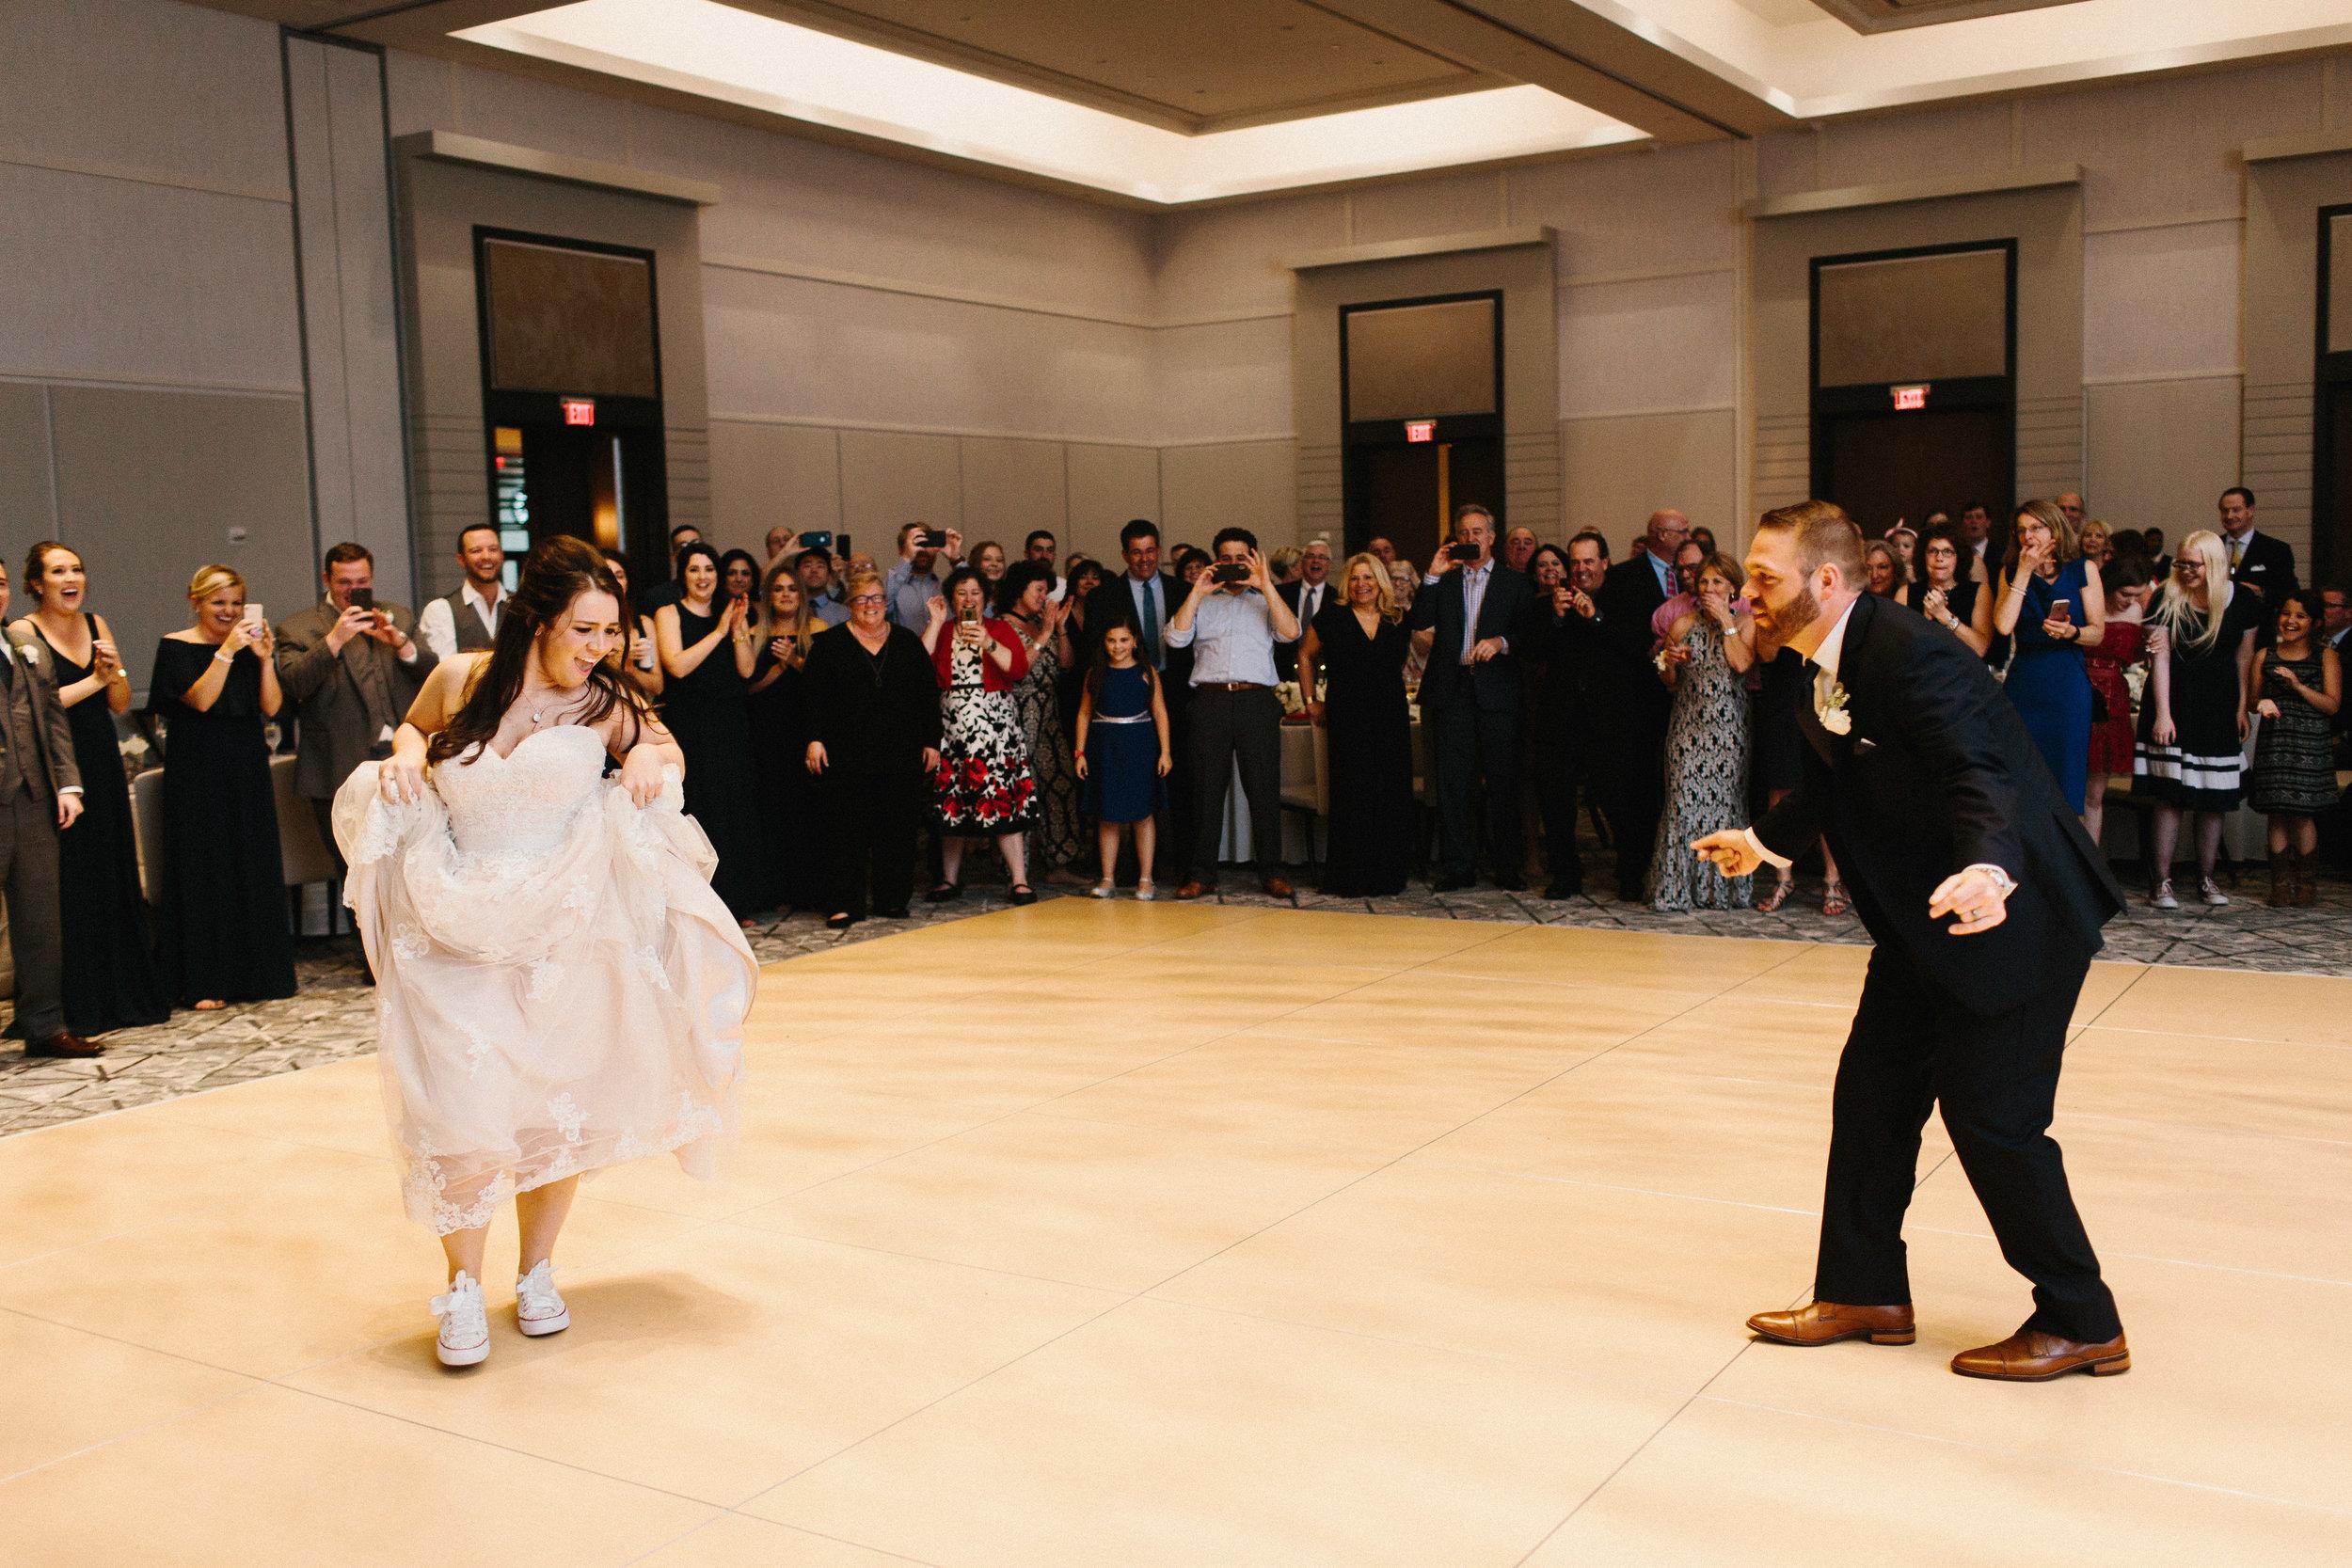 roswell_st_peter_chanel_catholic_avalon_hotel_alpharetta_wedding-2021.jpg